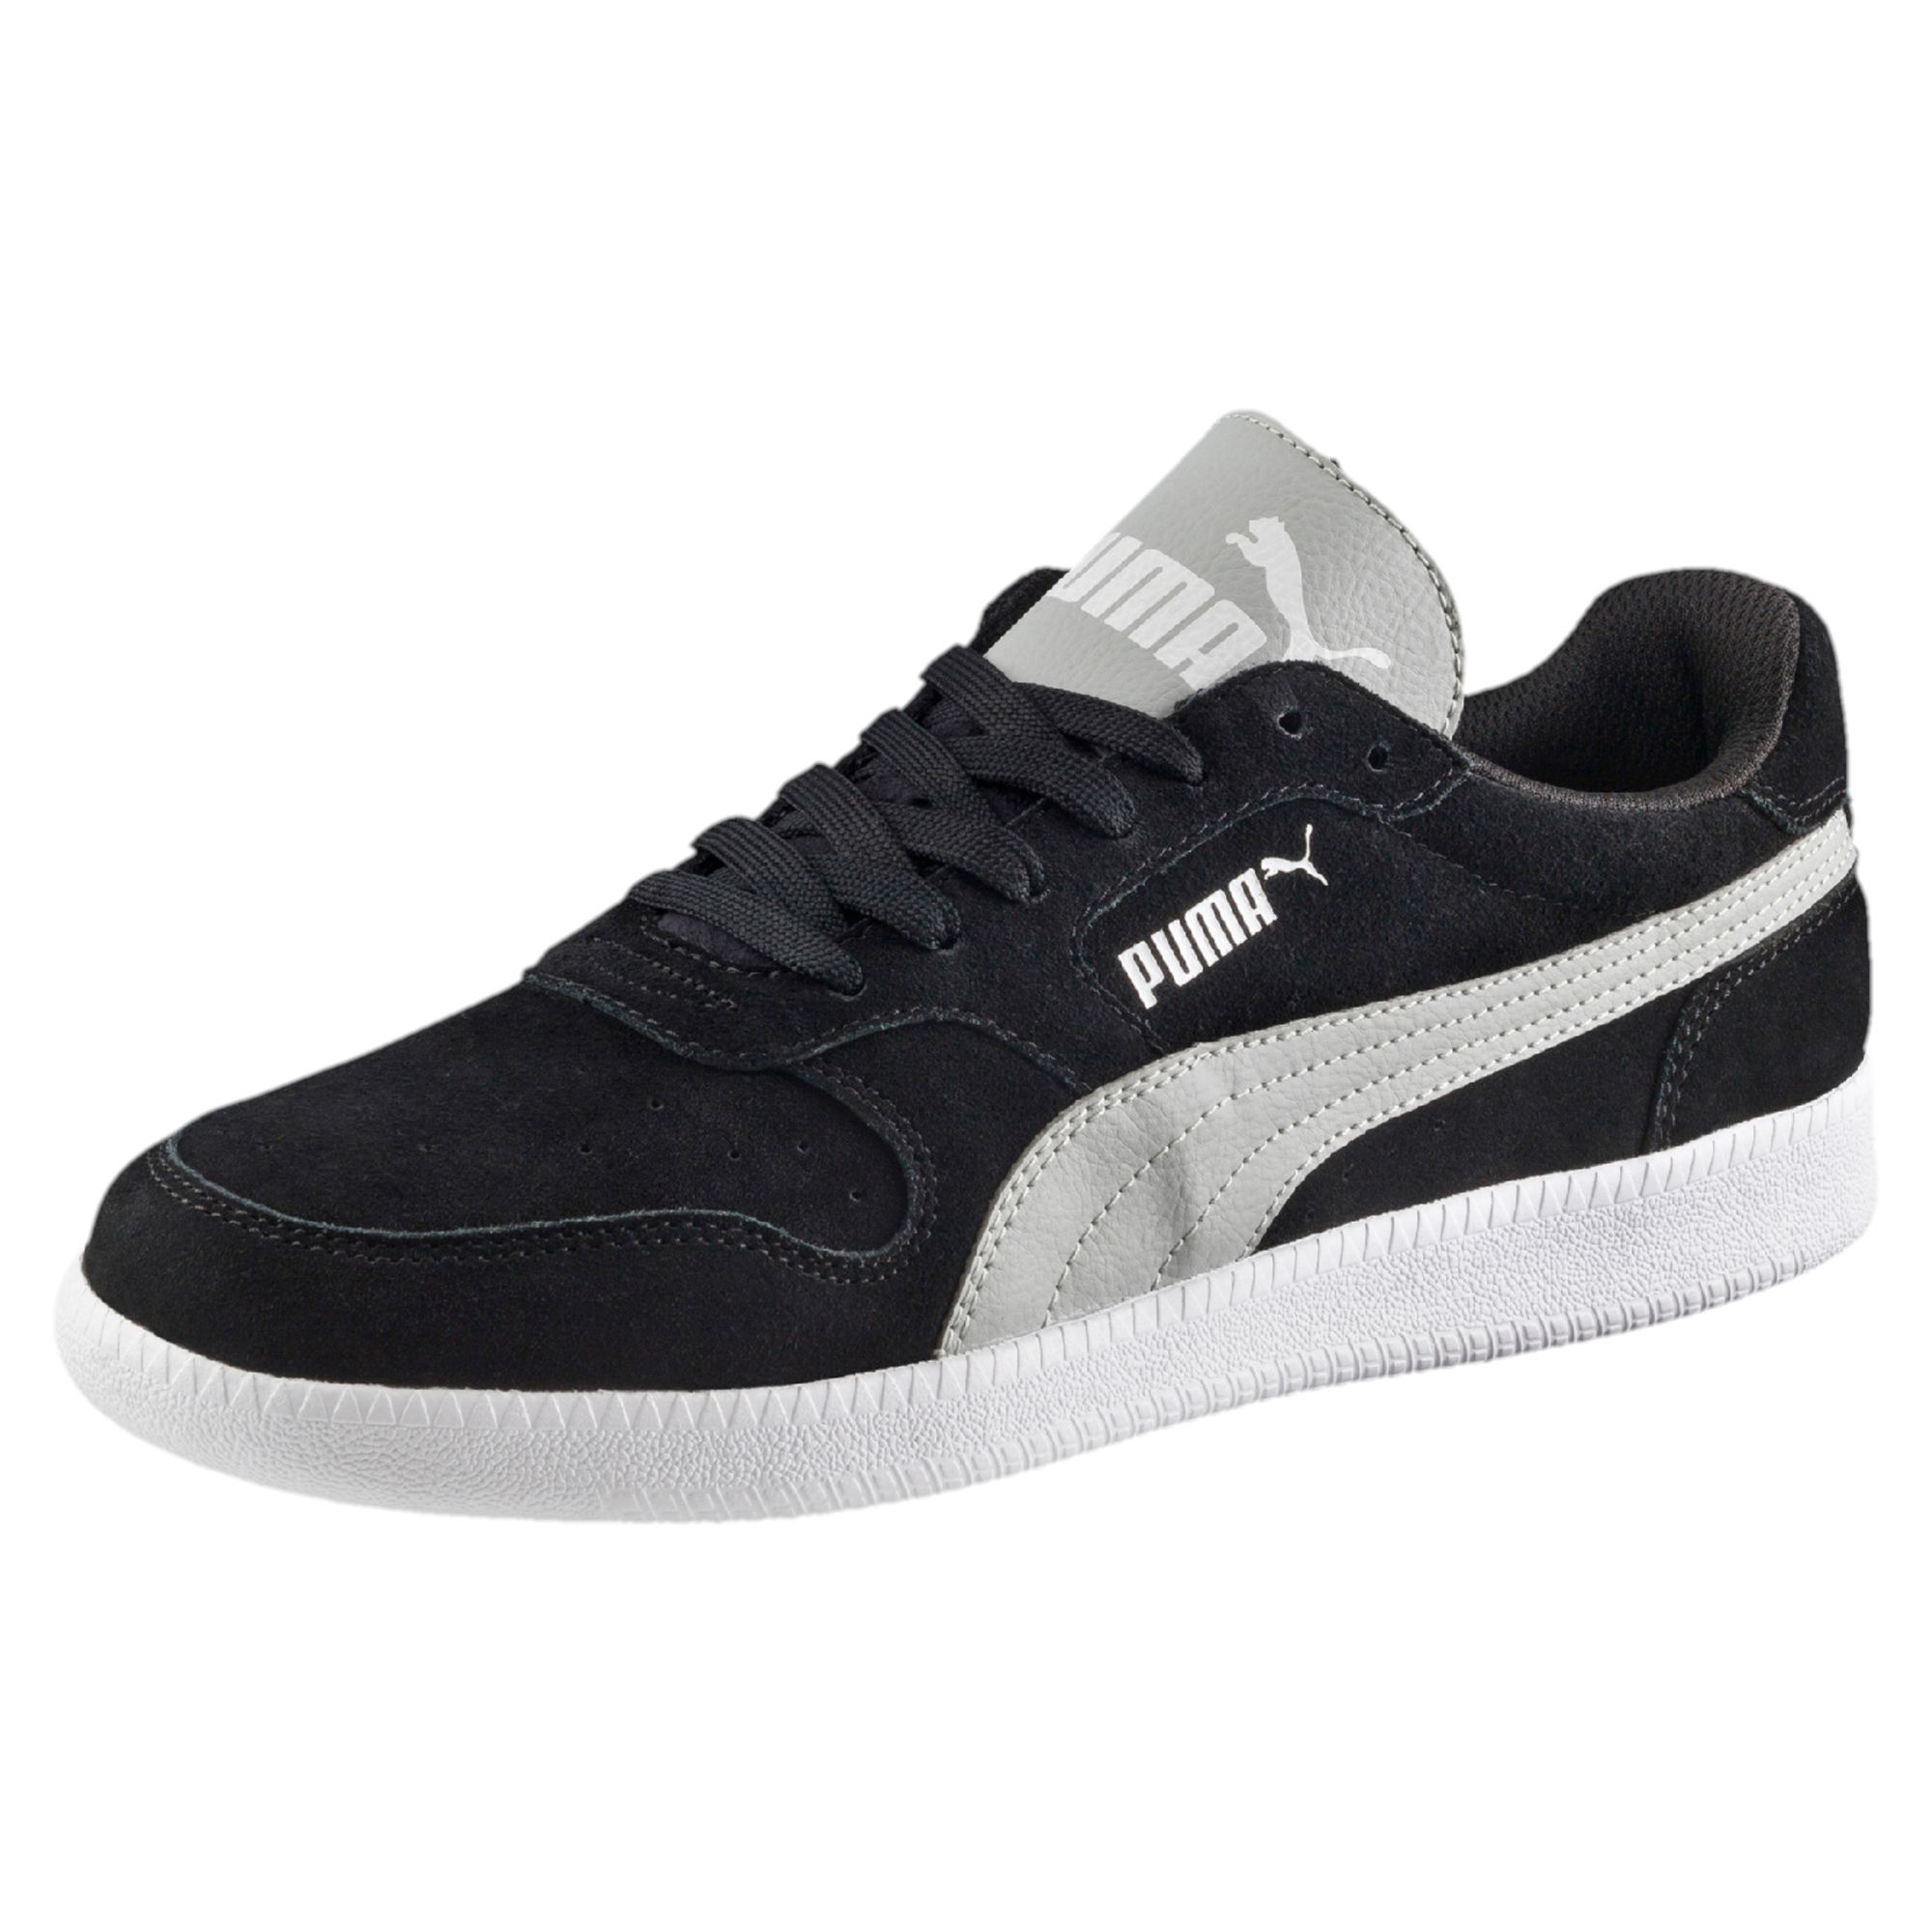 Image Puma Icra Suede Men's Sneakers #1